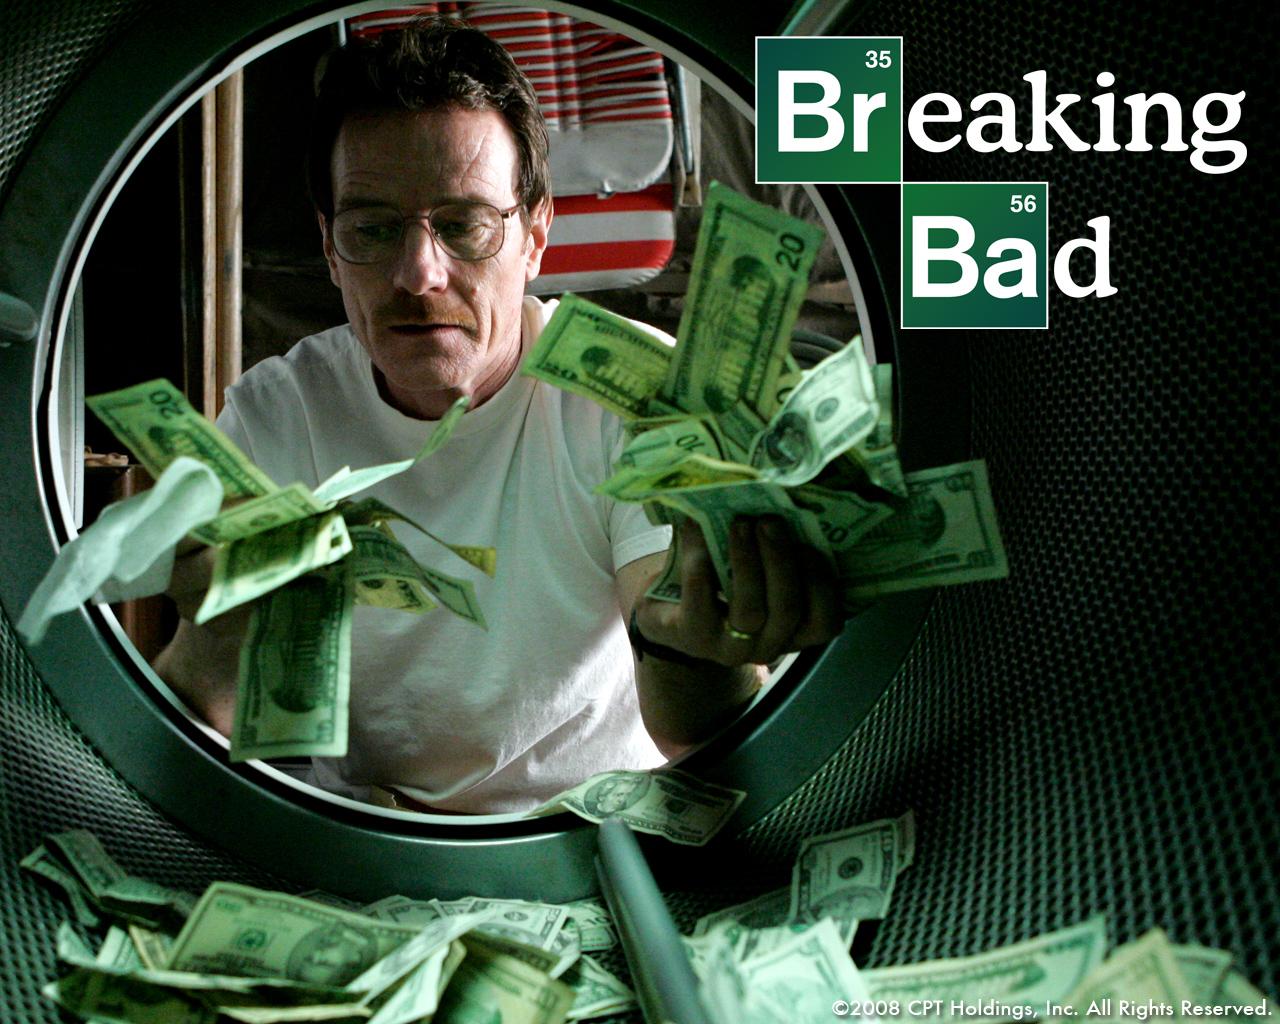 Breaking Bad Wallpapers Tv Show Hq Breaking Bad Pictures 4k Wallpapers 2019